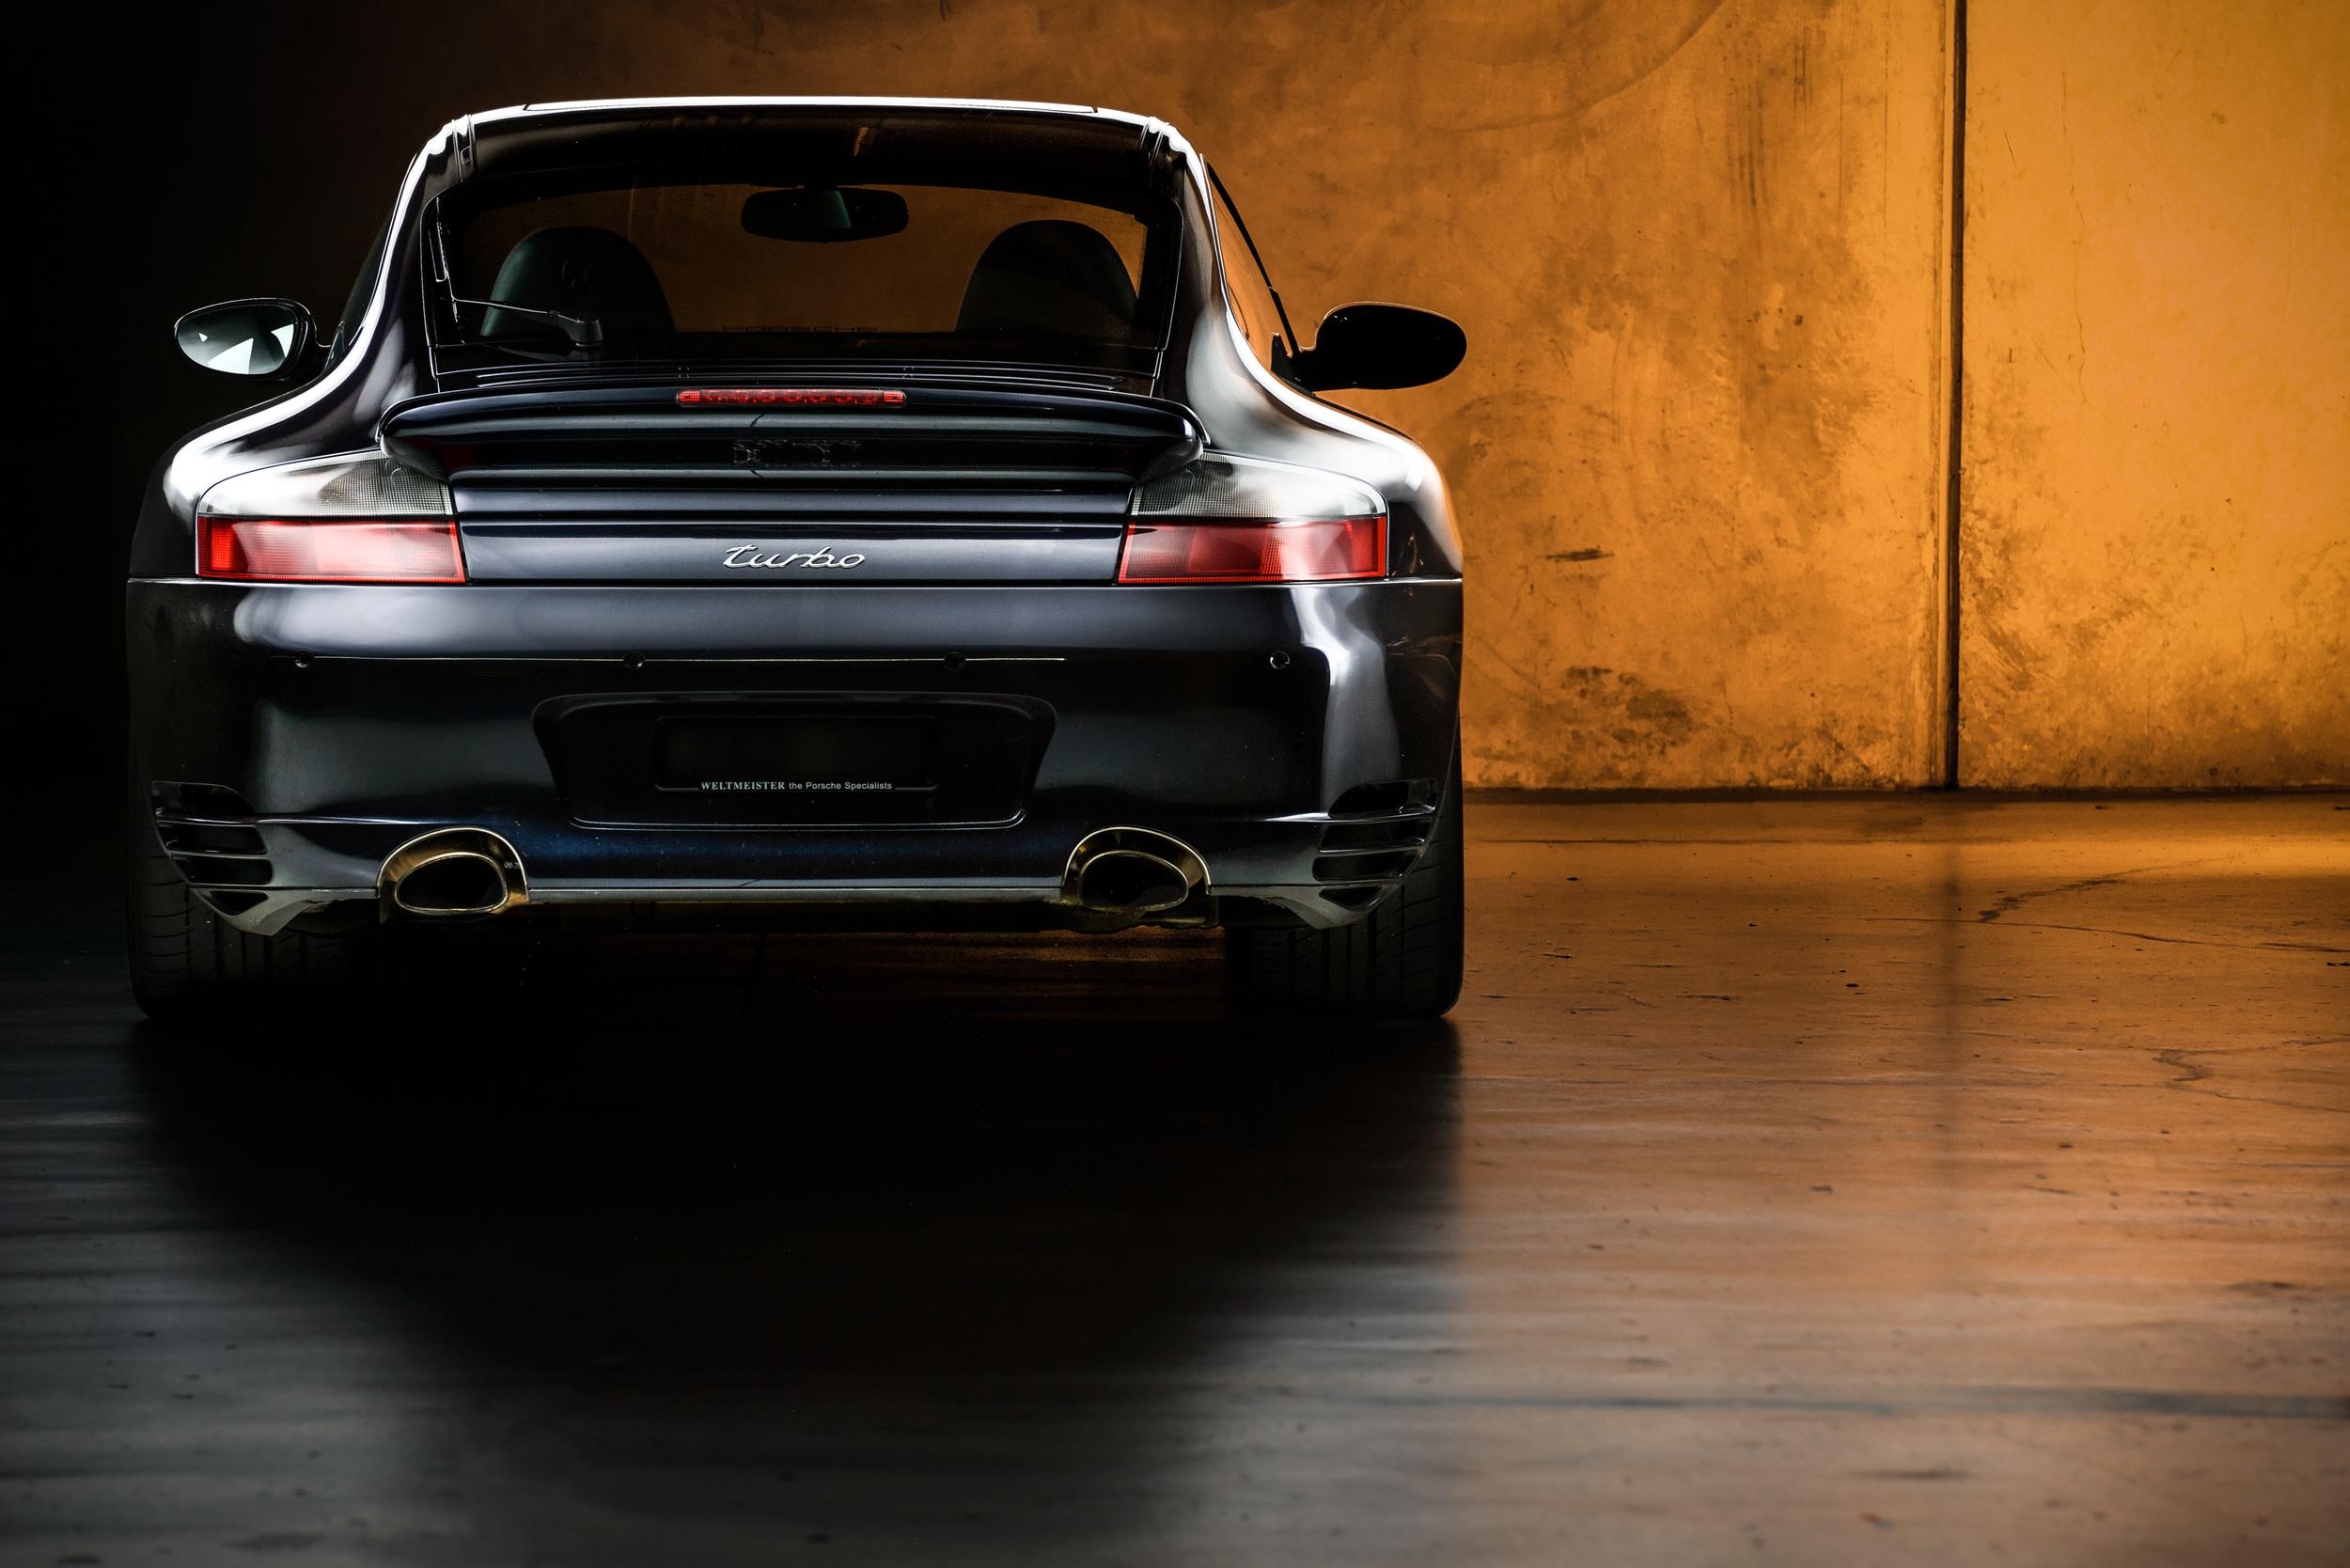 Light Painting - Porsche 996 in car park